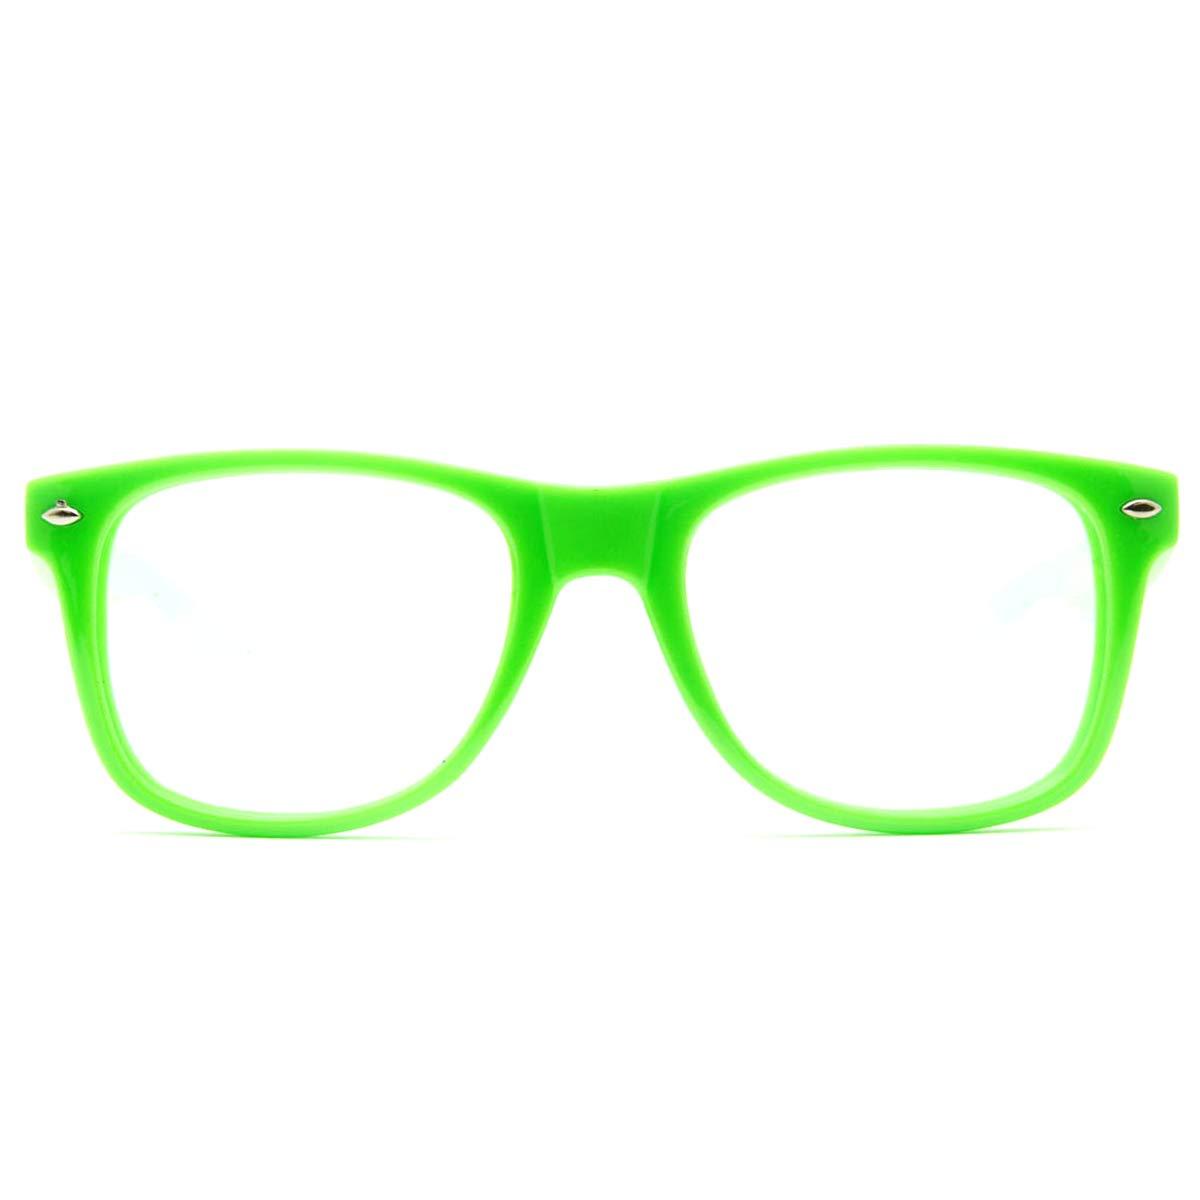 f32e690bd3ba0 Amazon.com  GloFX Ultimate Diffraction Glasses - Green - Rave Glasses   Clothing